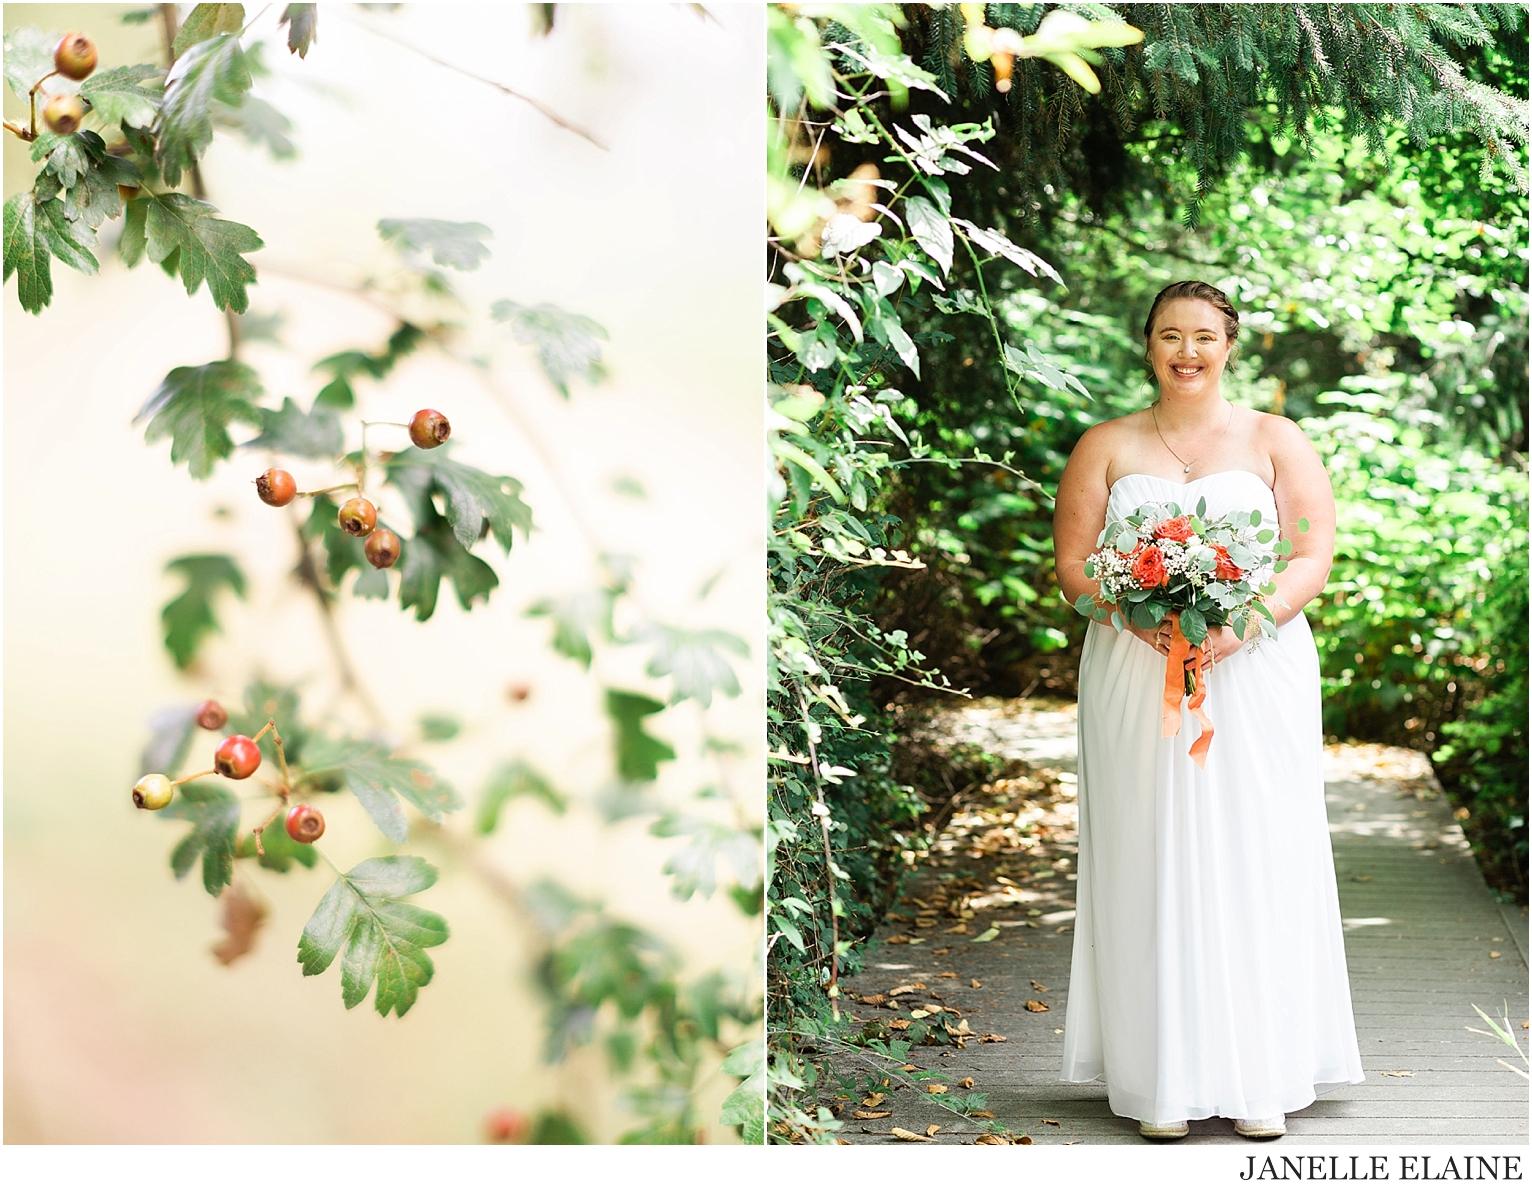 details-extras-liz and christina wedding-luther burbank park-mercer island-washington-janelle elaine photography-2.jpg